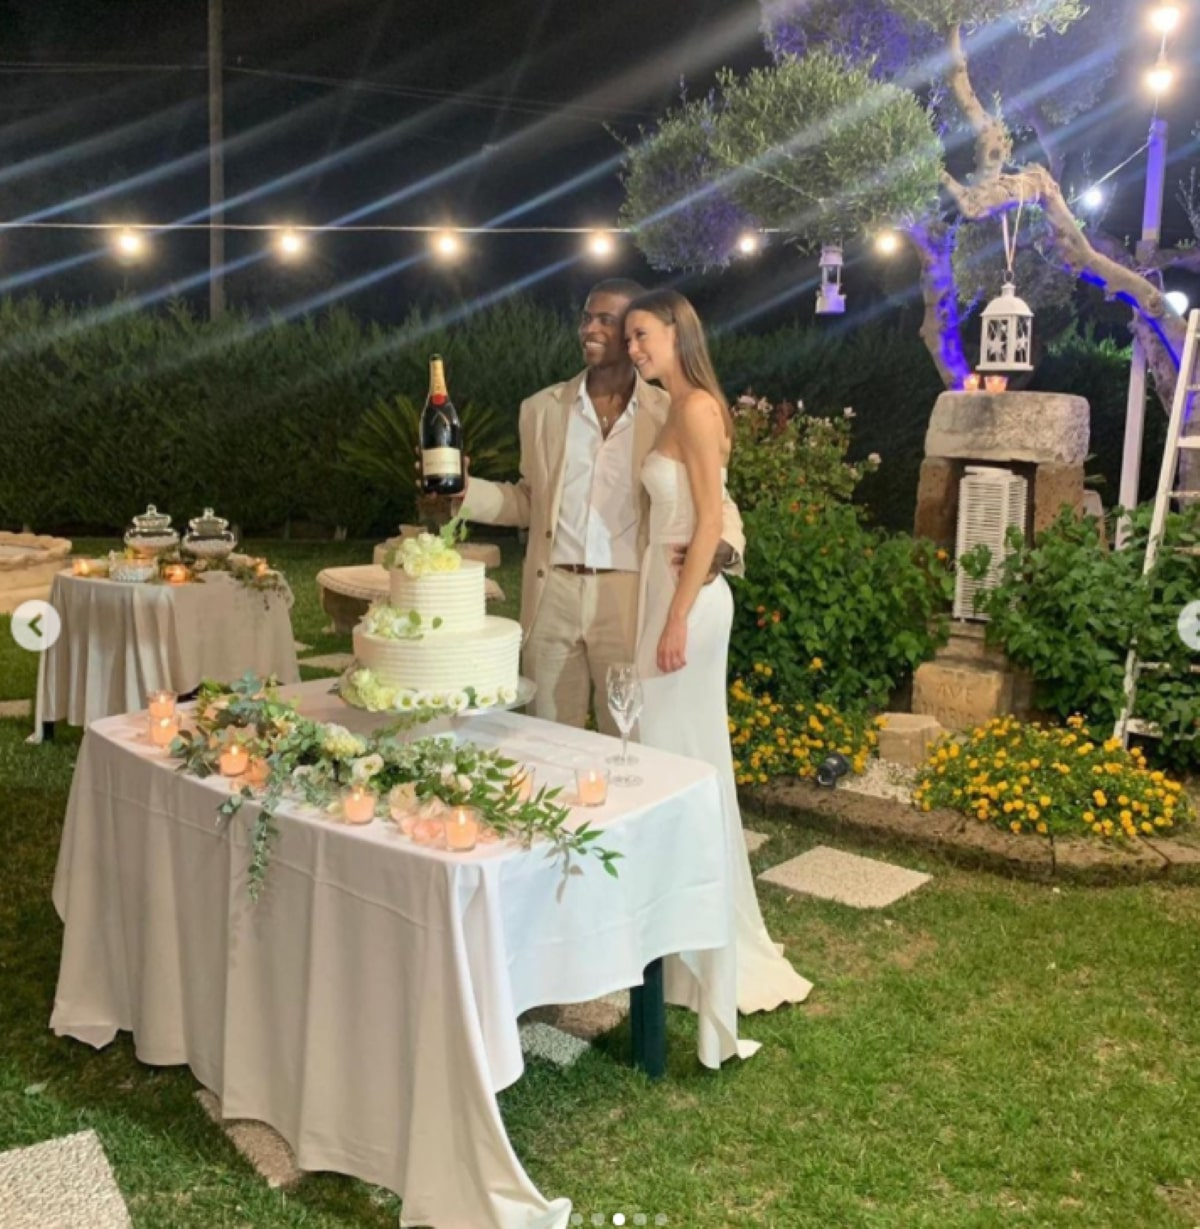 Bryan Ramirez Paola De Filippis Sposi Ex Amici